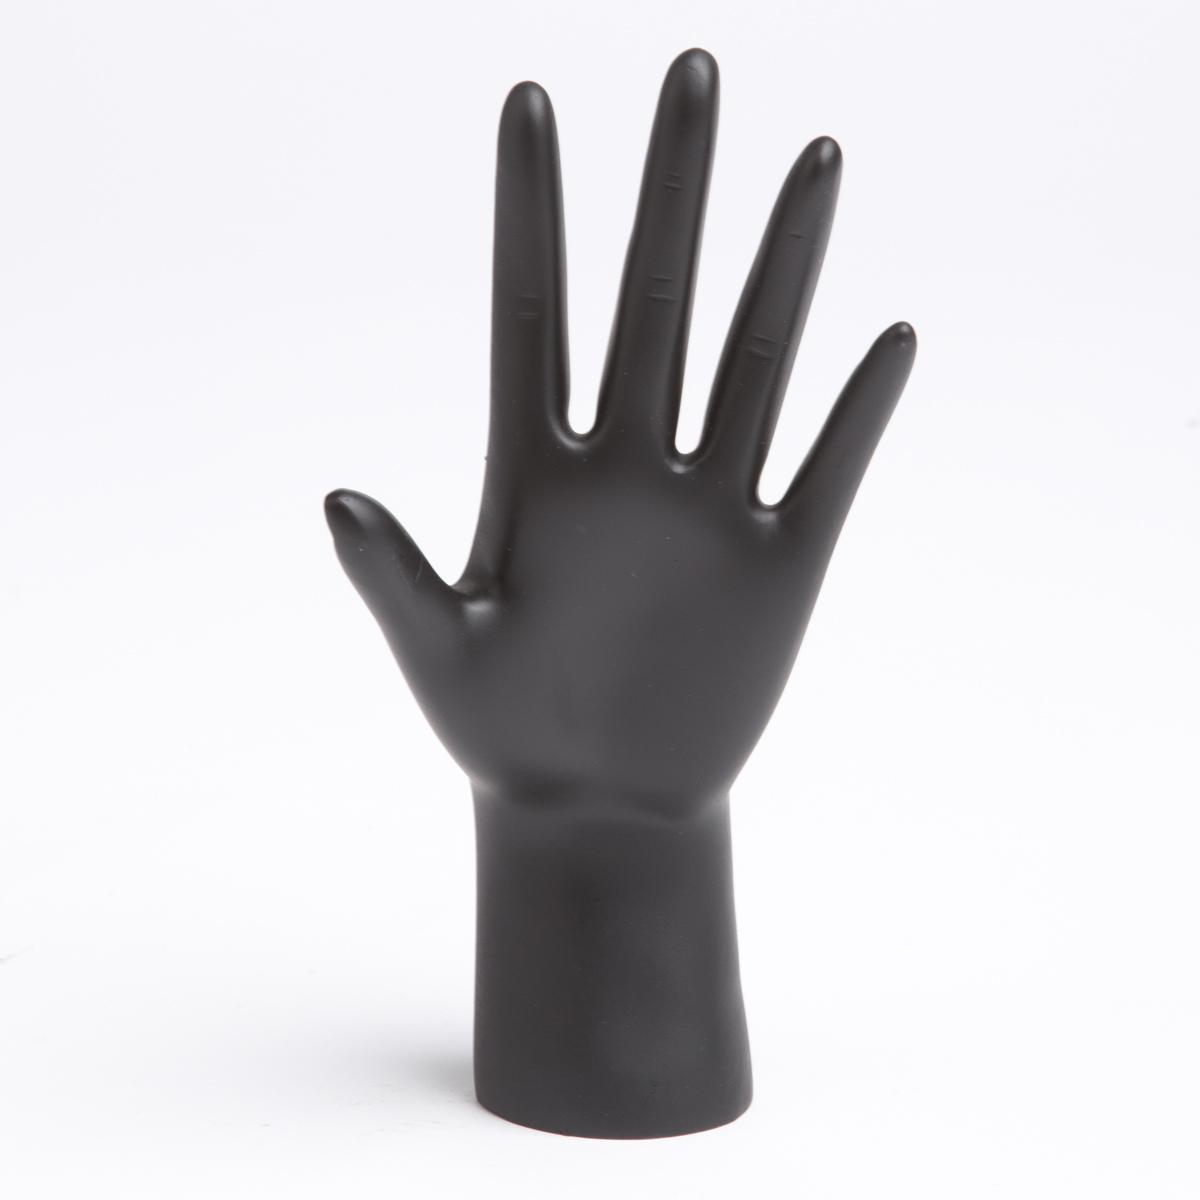 HAND DISPLAY-SMALL